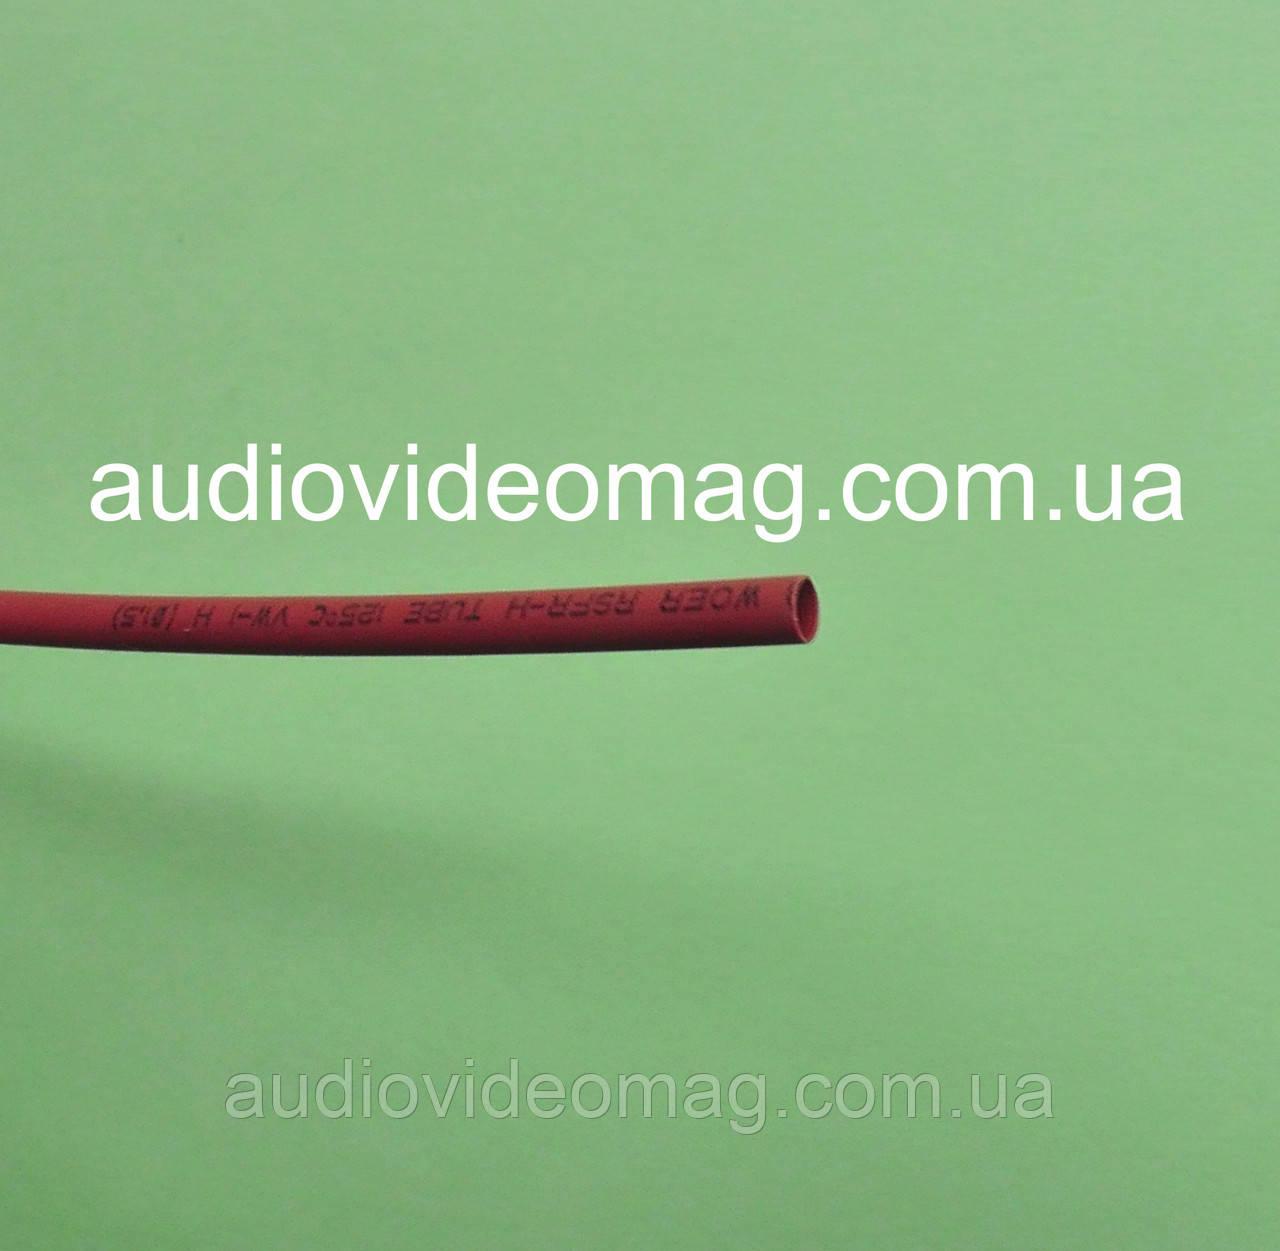 Термоусадочная трубка (2:1) - 1.5/0.75 мм, 1 метр, красная